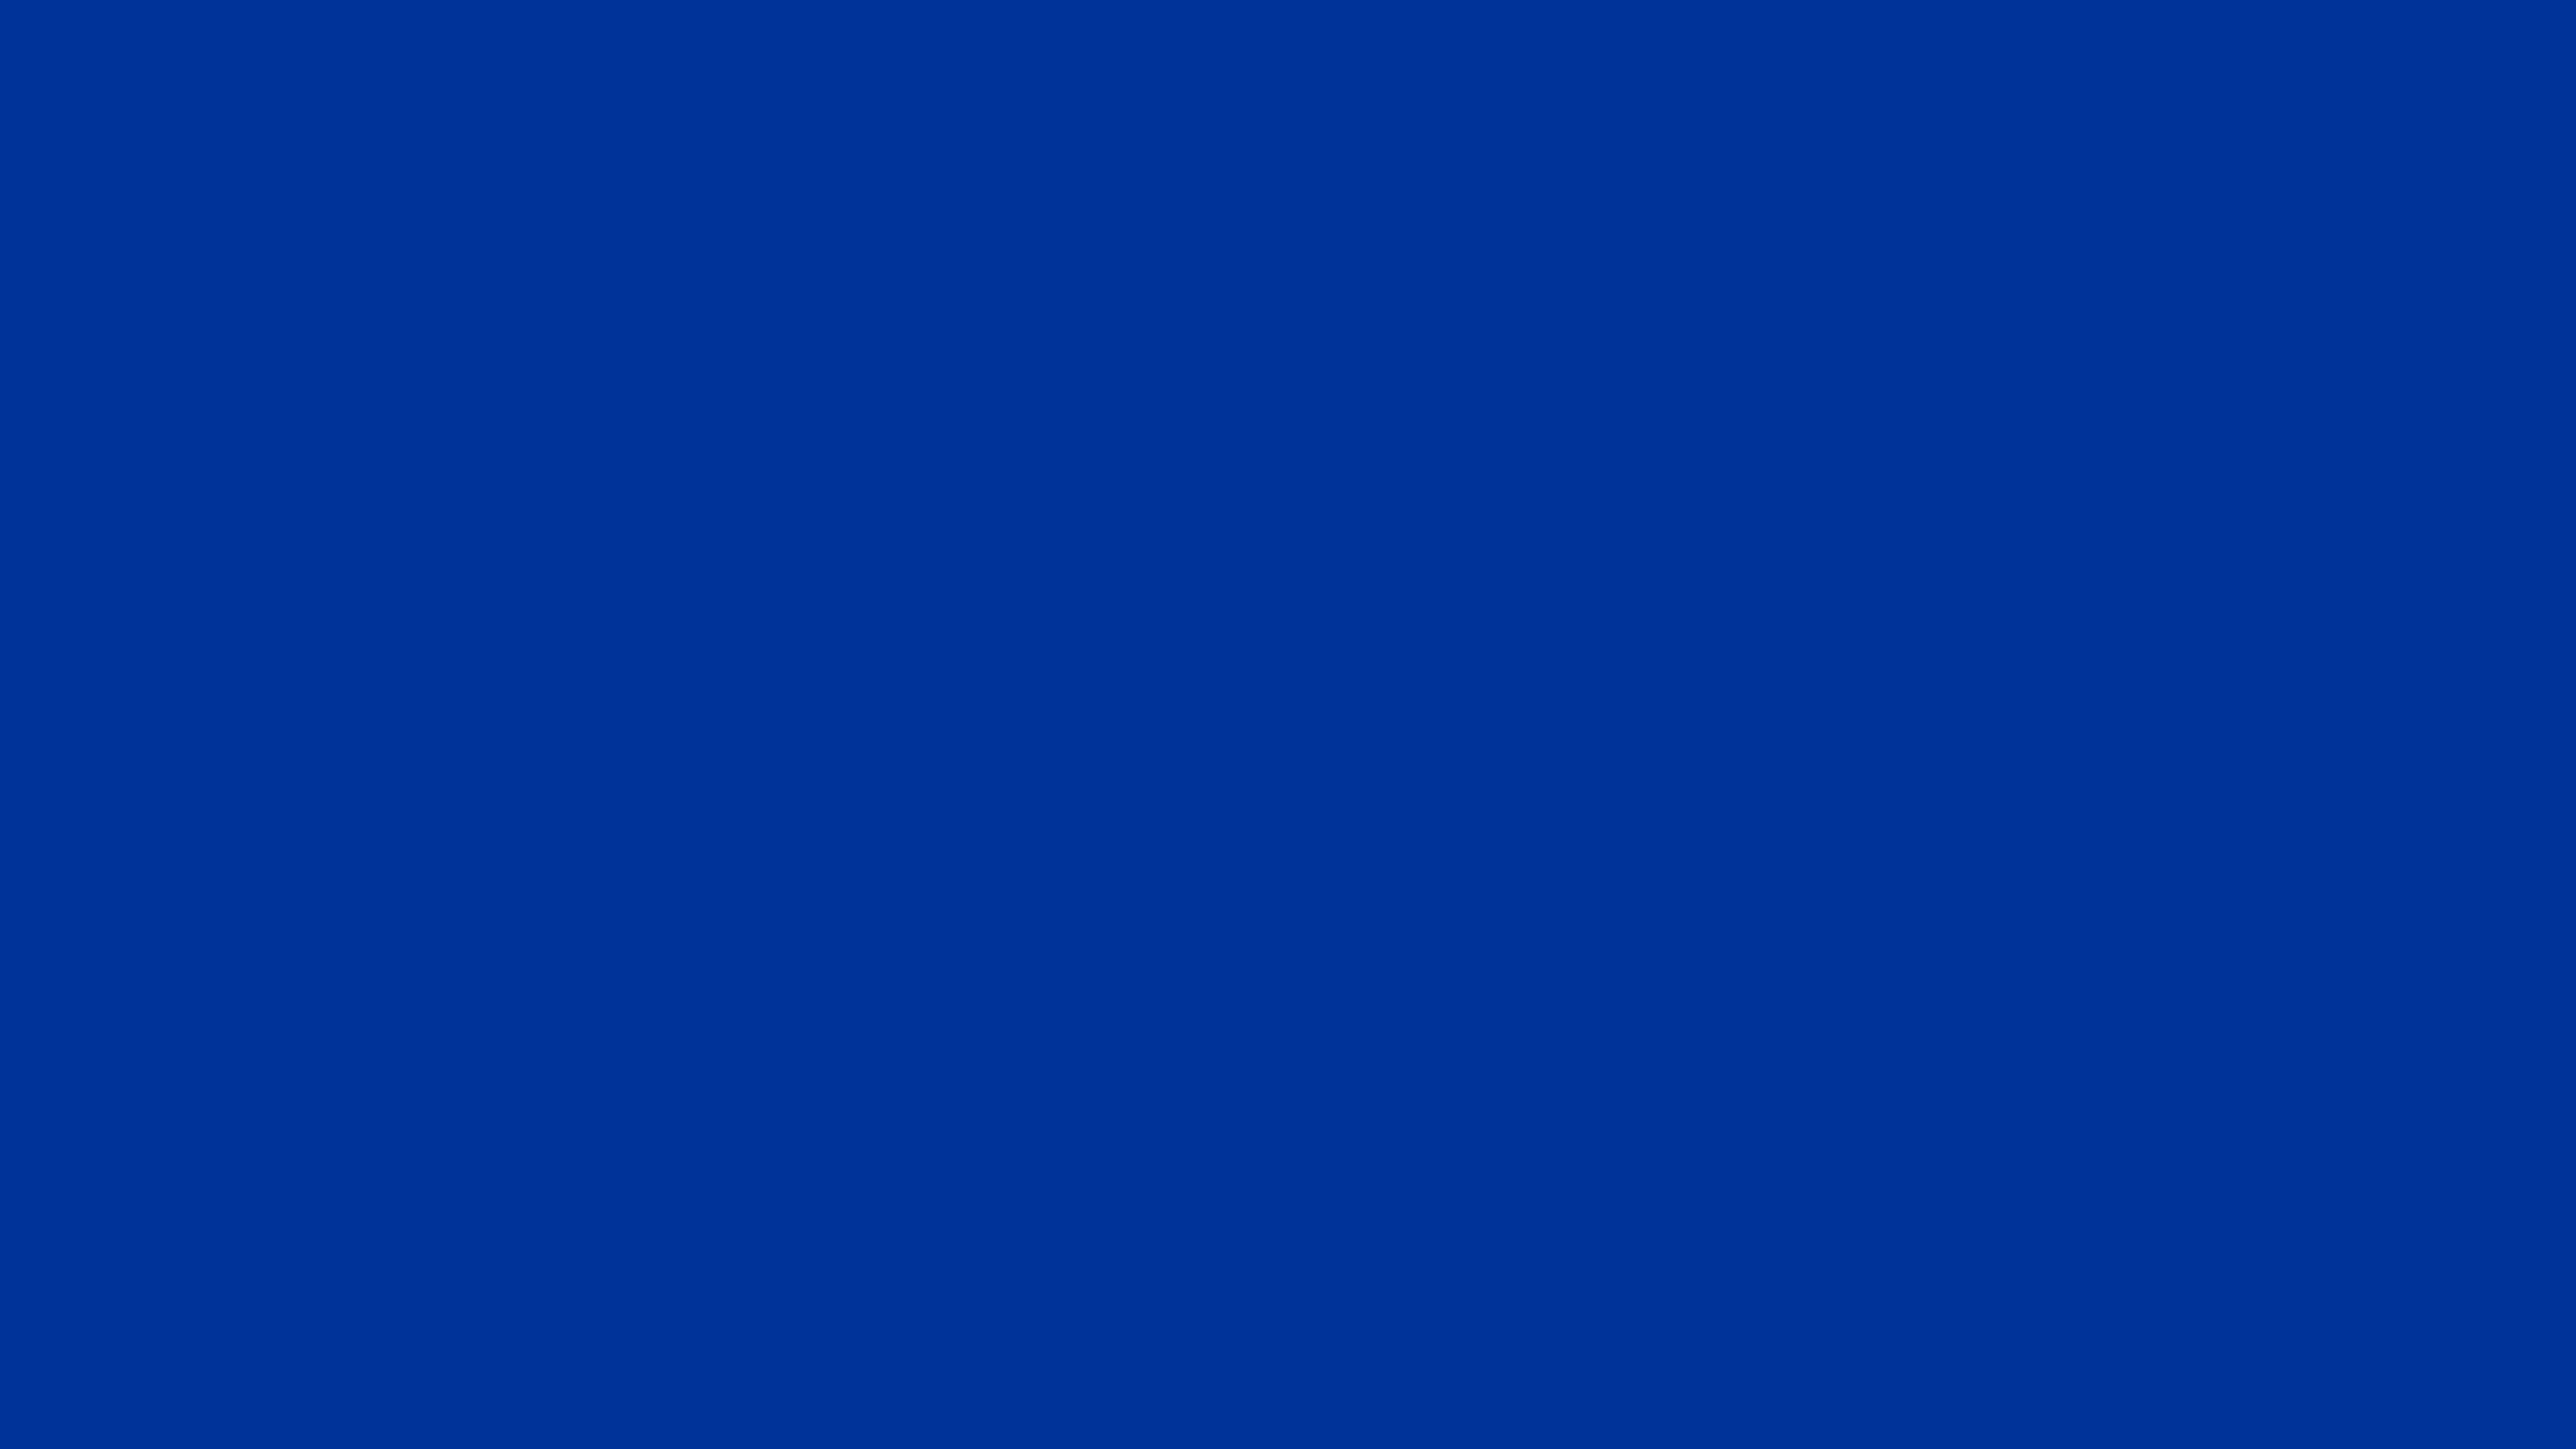 3840x2160 Smalt Dark Powder Blue Solid Color Background